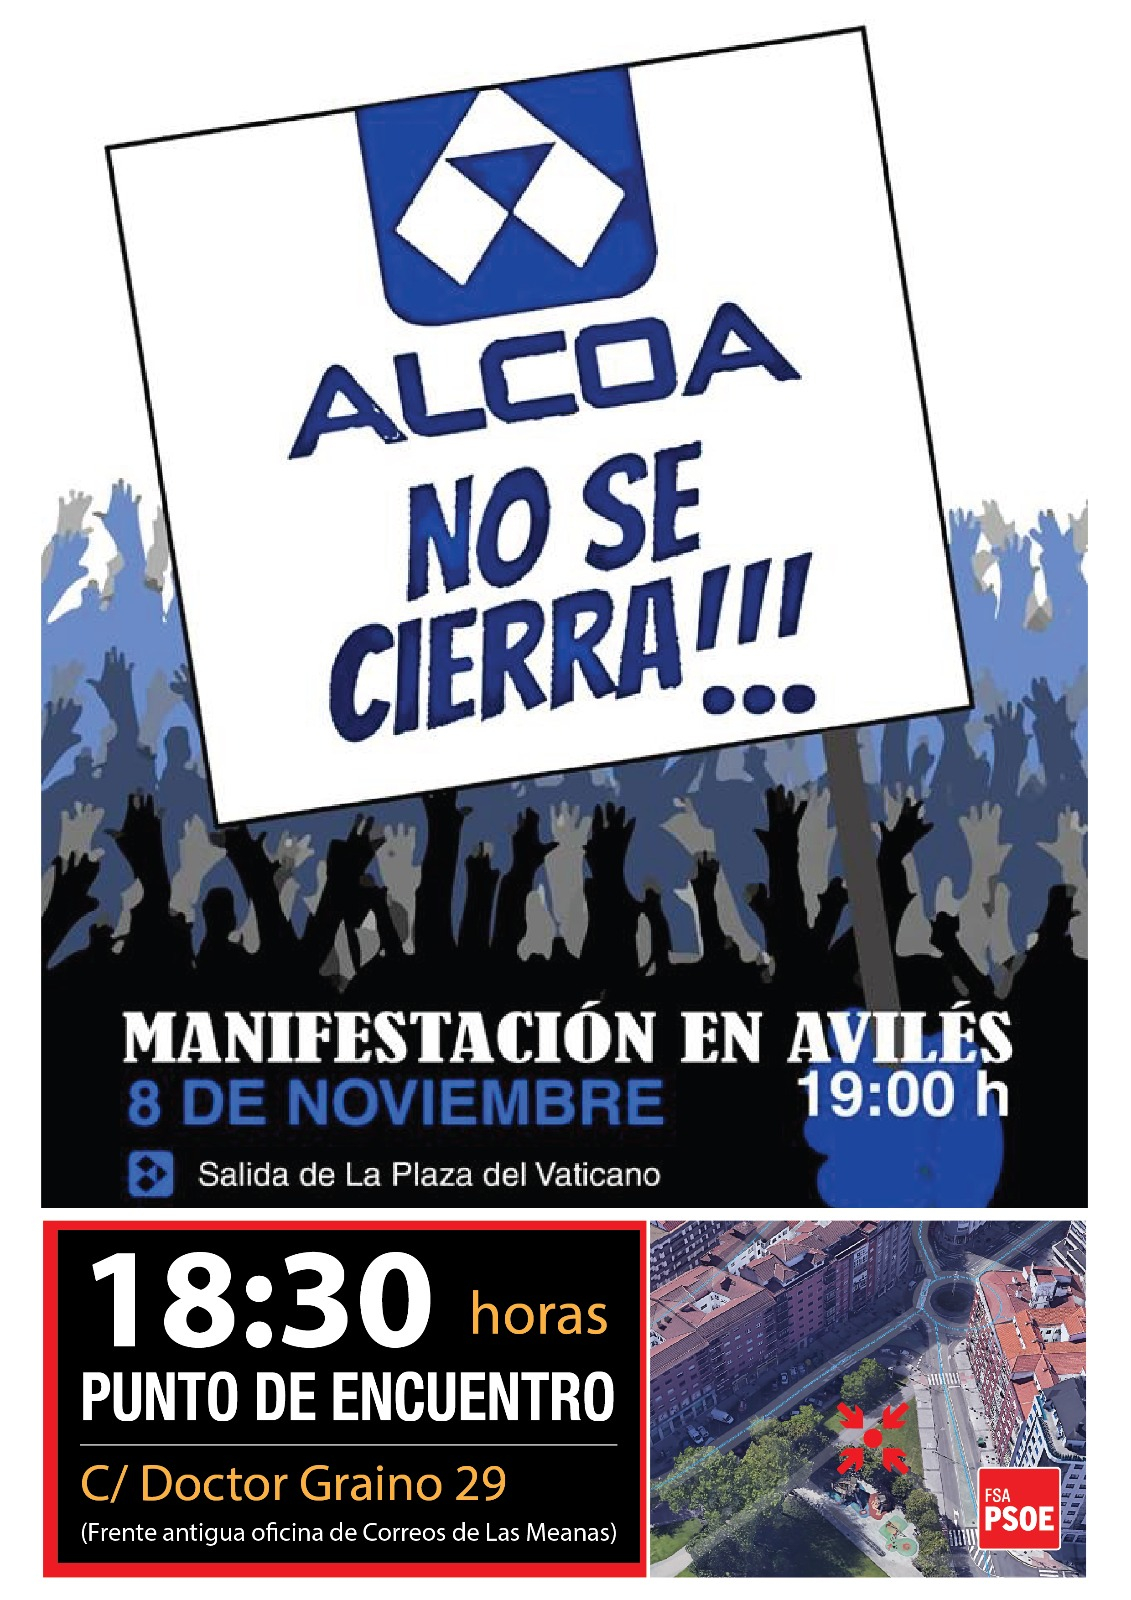 181108_Aviles_Manifestacion_ALCOA_no_se_cierra